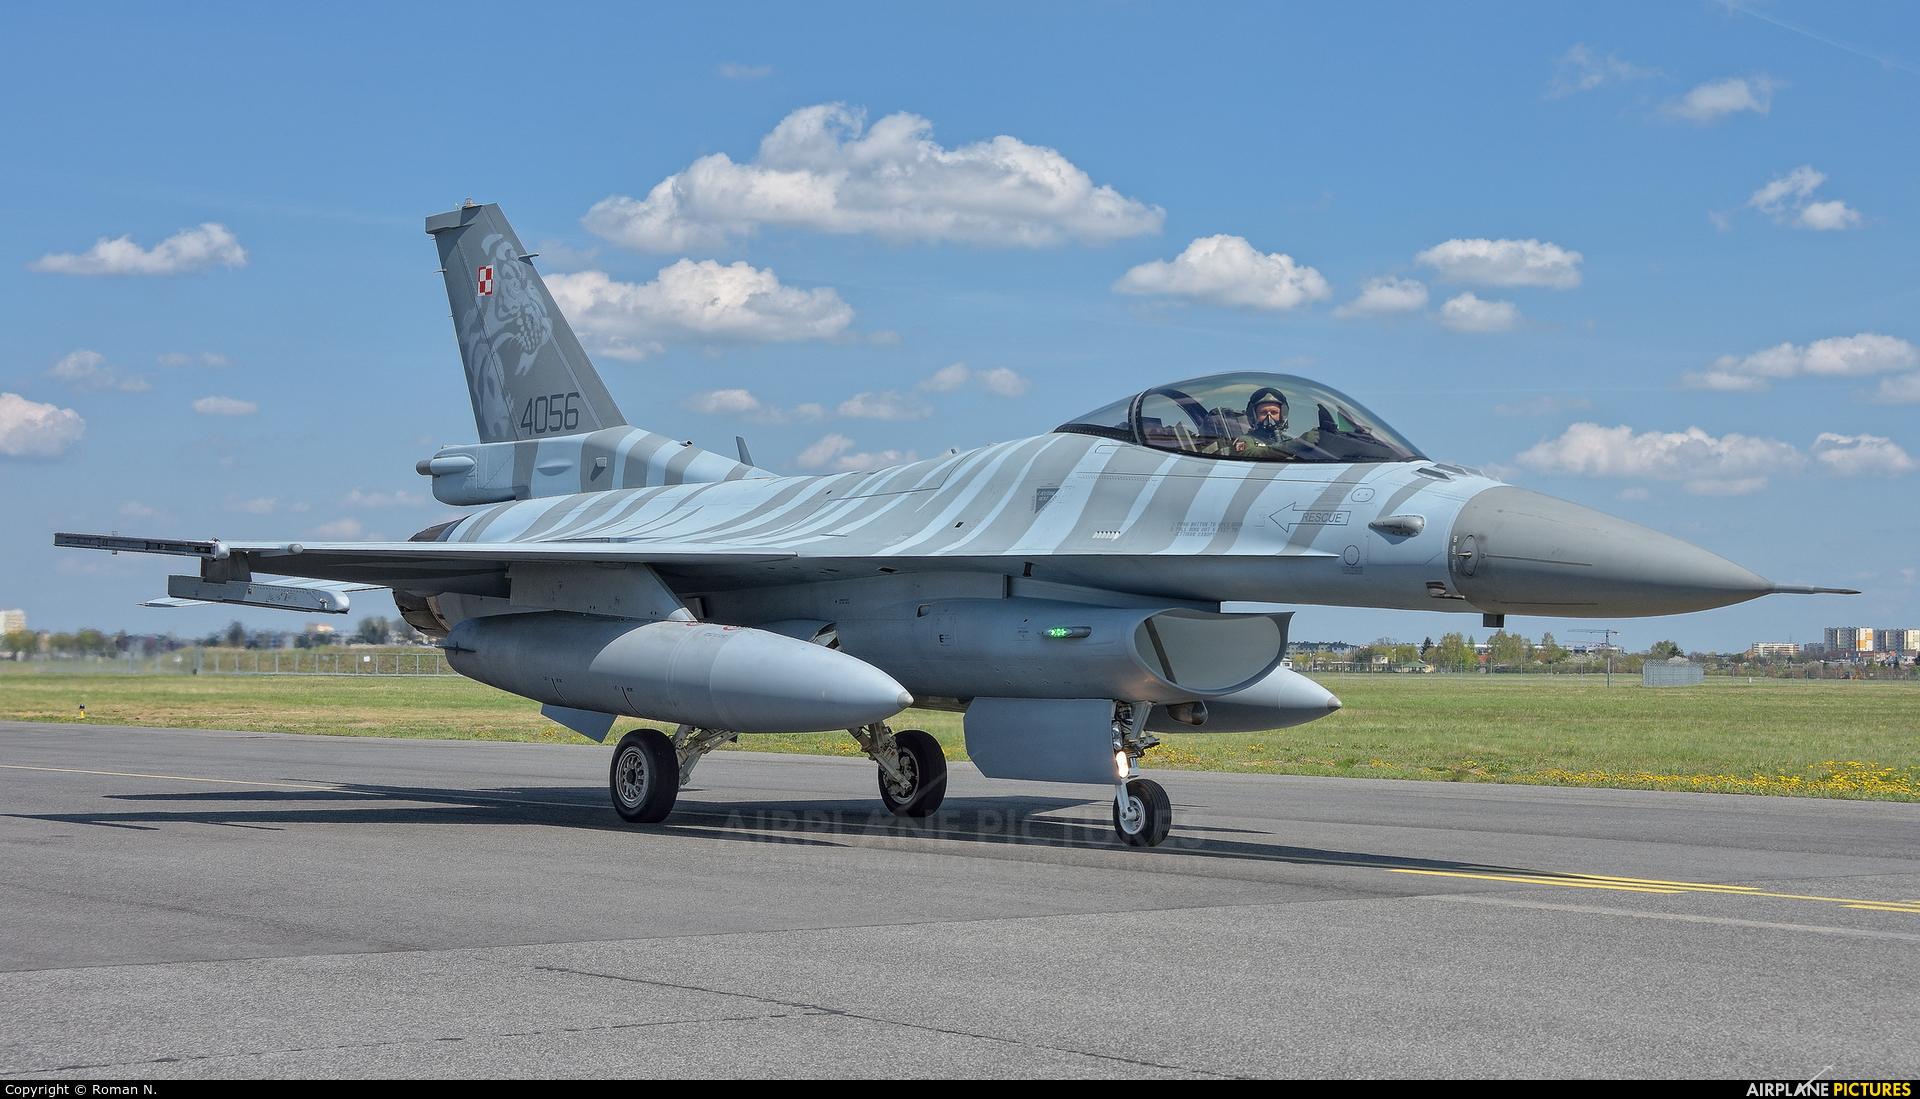 Poland - Air Force 4056 aircraft at Bydgoszcz - Szwederowo